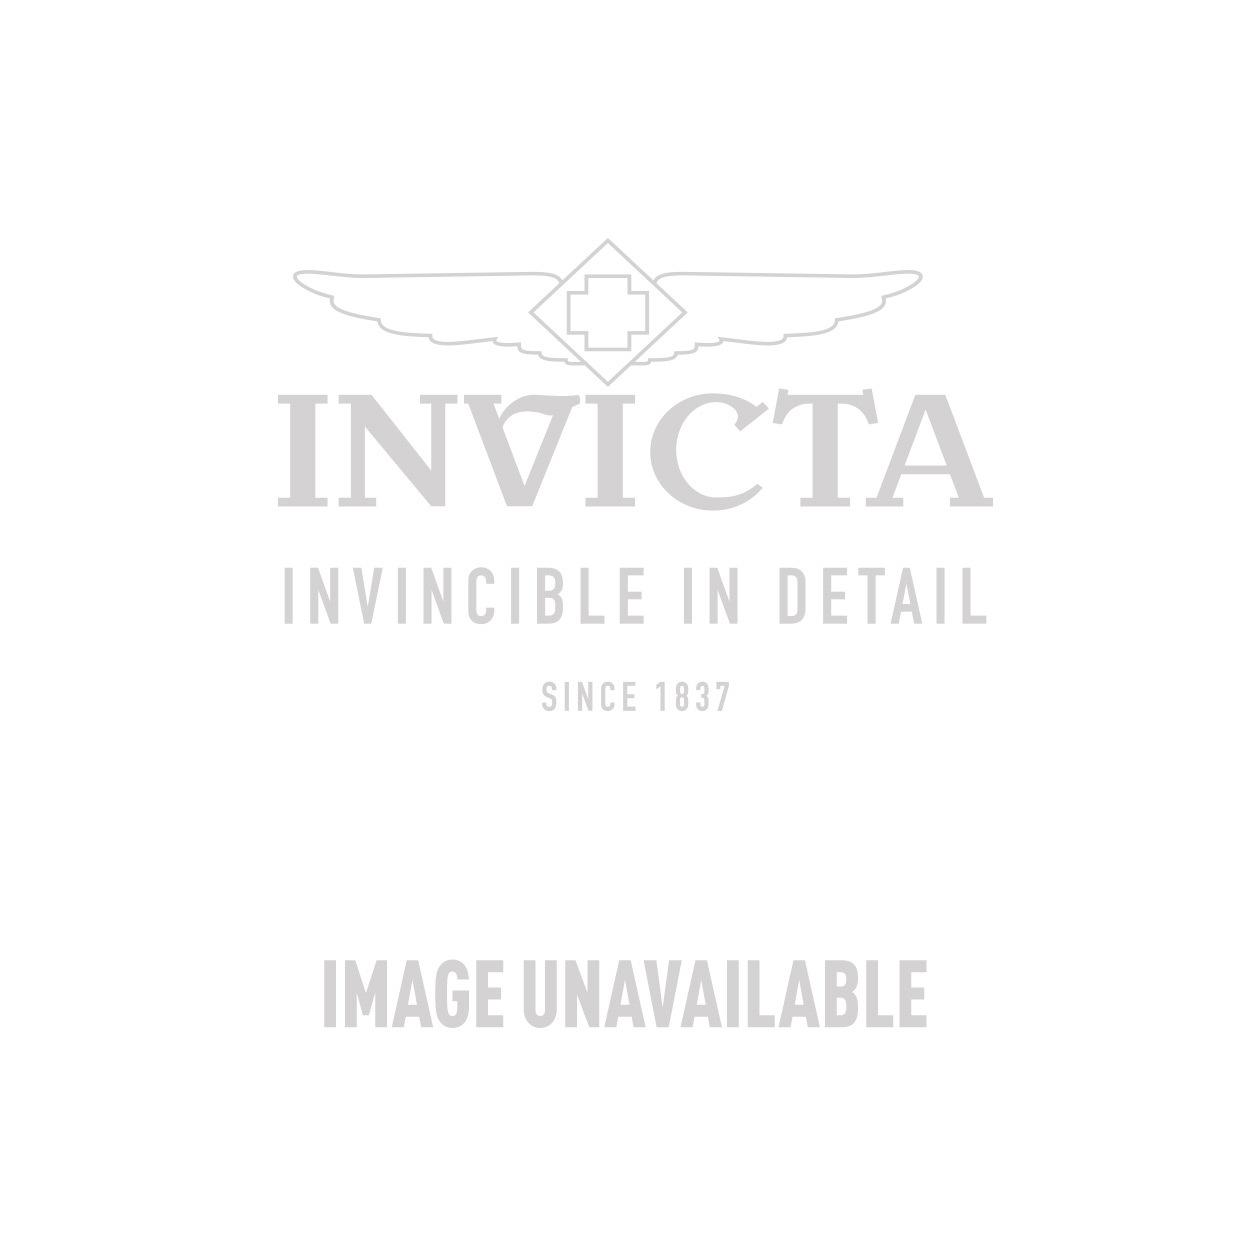 Invicta Venom Swiss Made Quartz Watch - Gunmetal case with Black tone Leather band - Model 13890